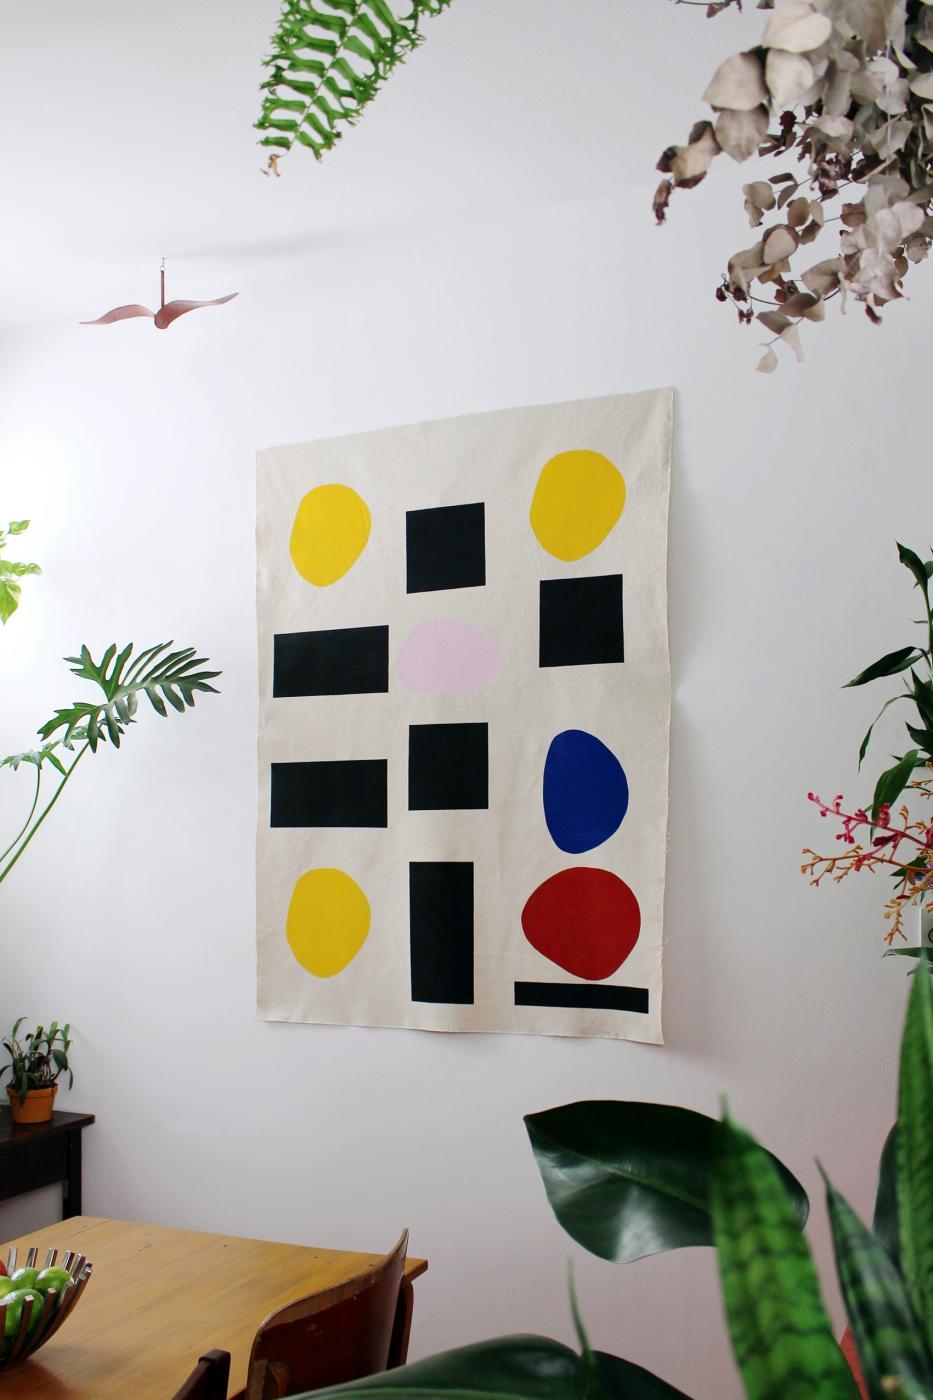 2815-painel-de-tecido-cores-e-barreiras-sancinetti-1-1400